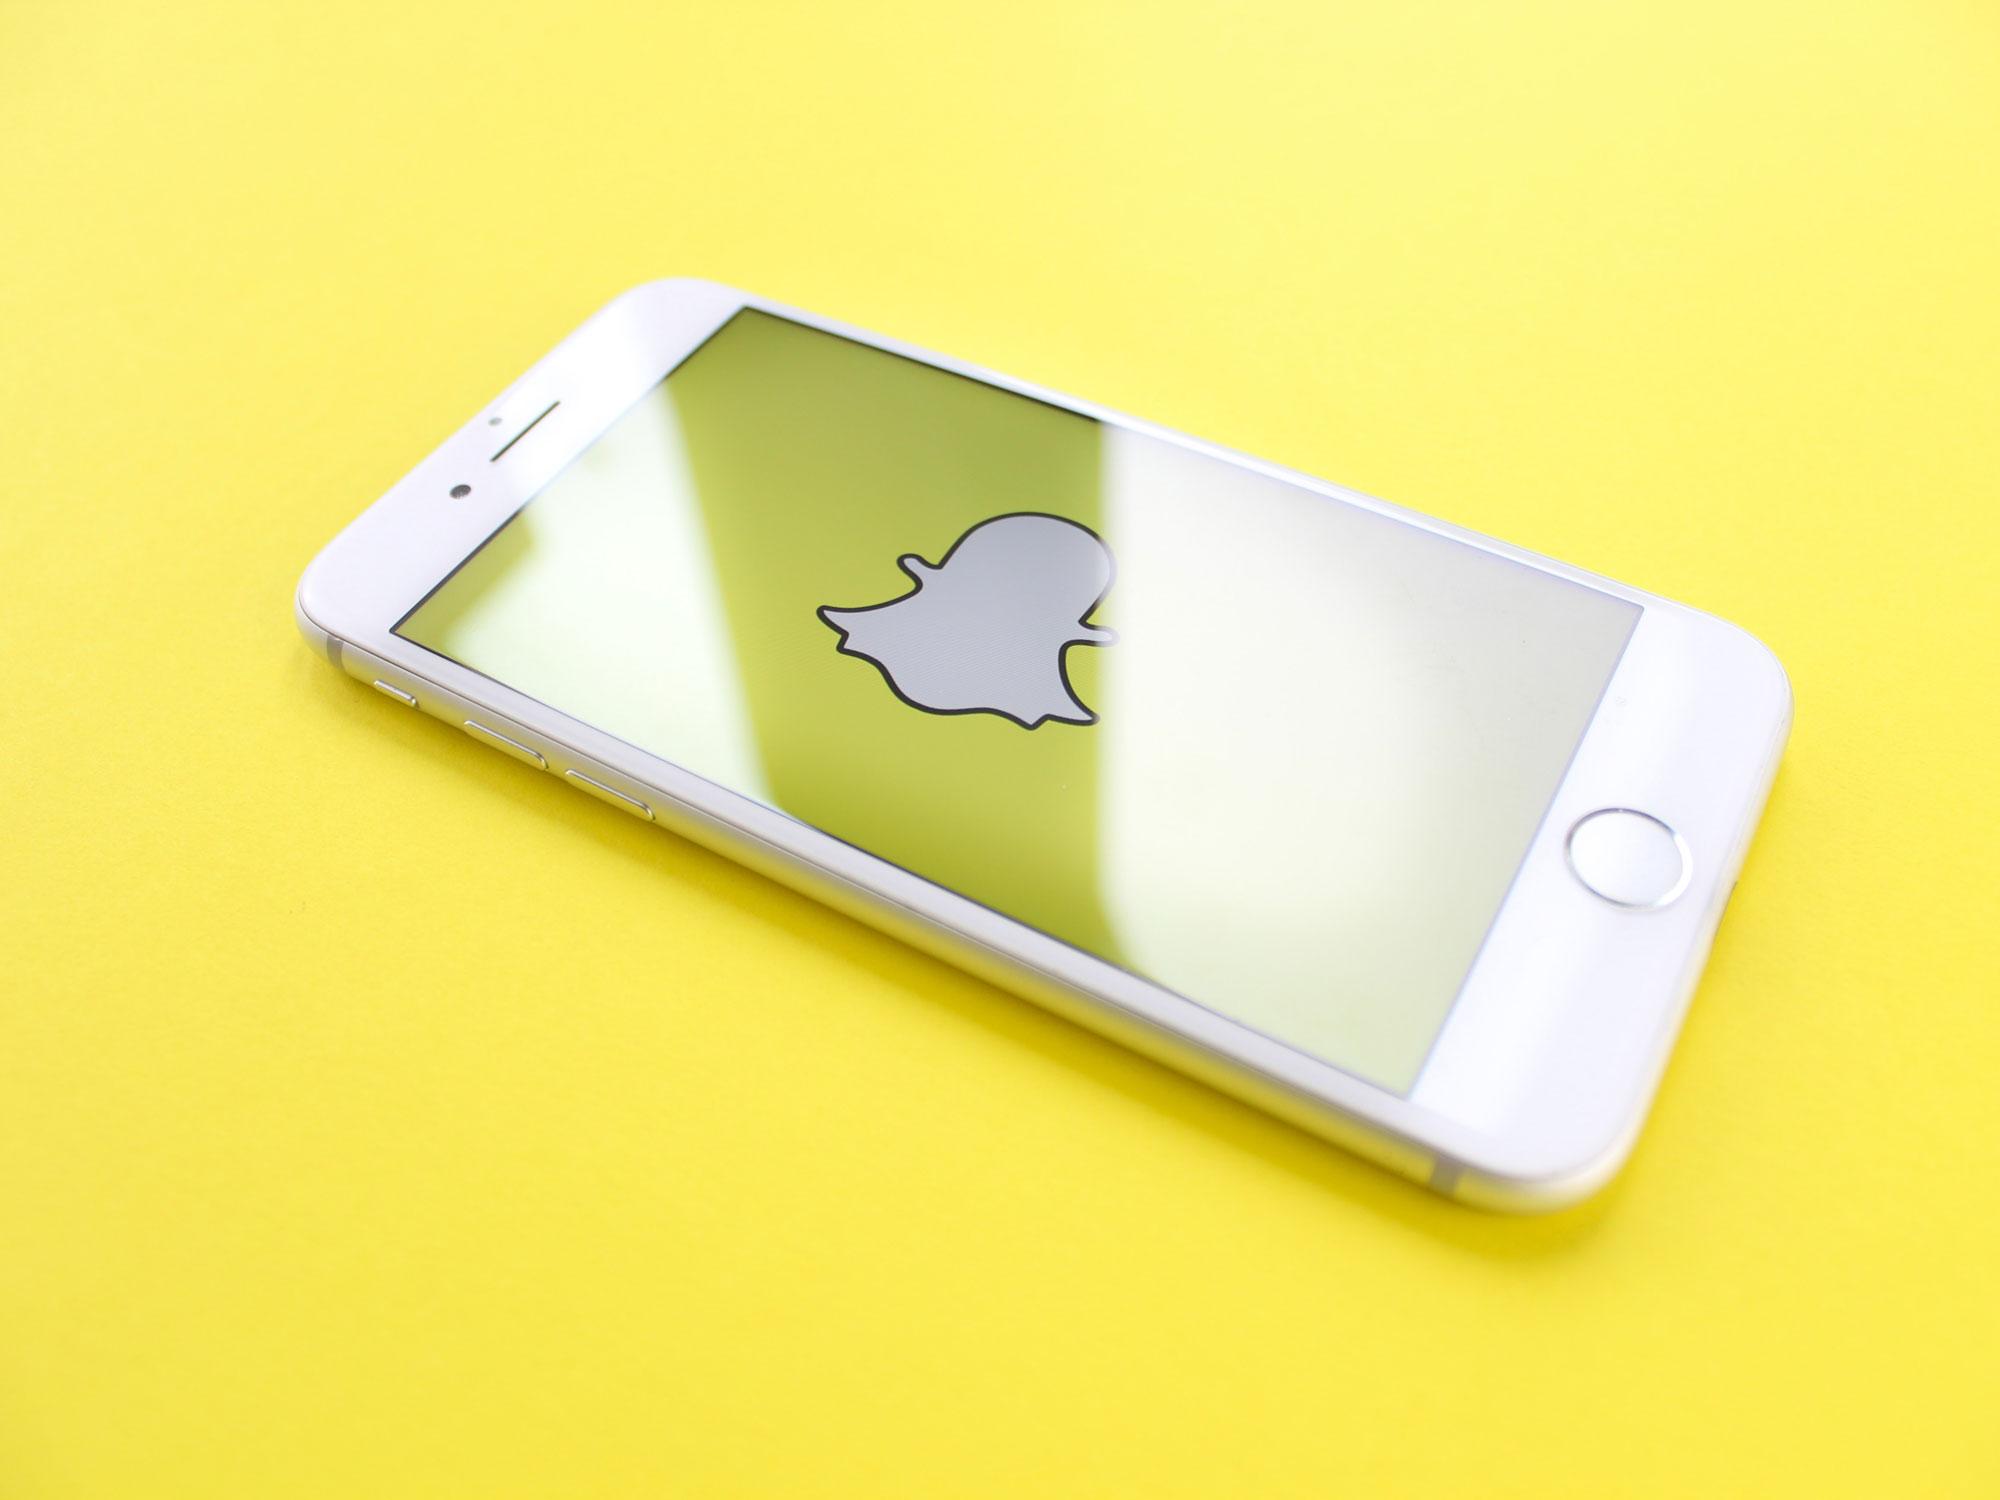 De gros changements en perspective sur Snapchat - Agence Sharing